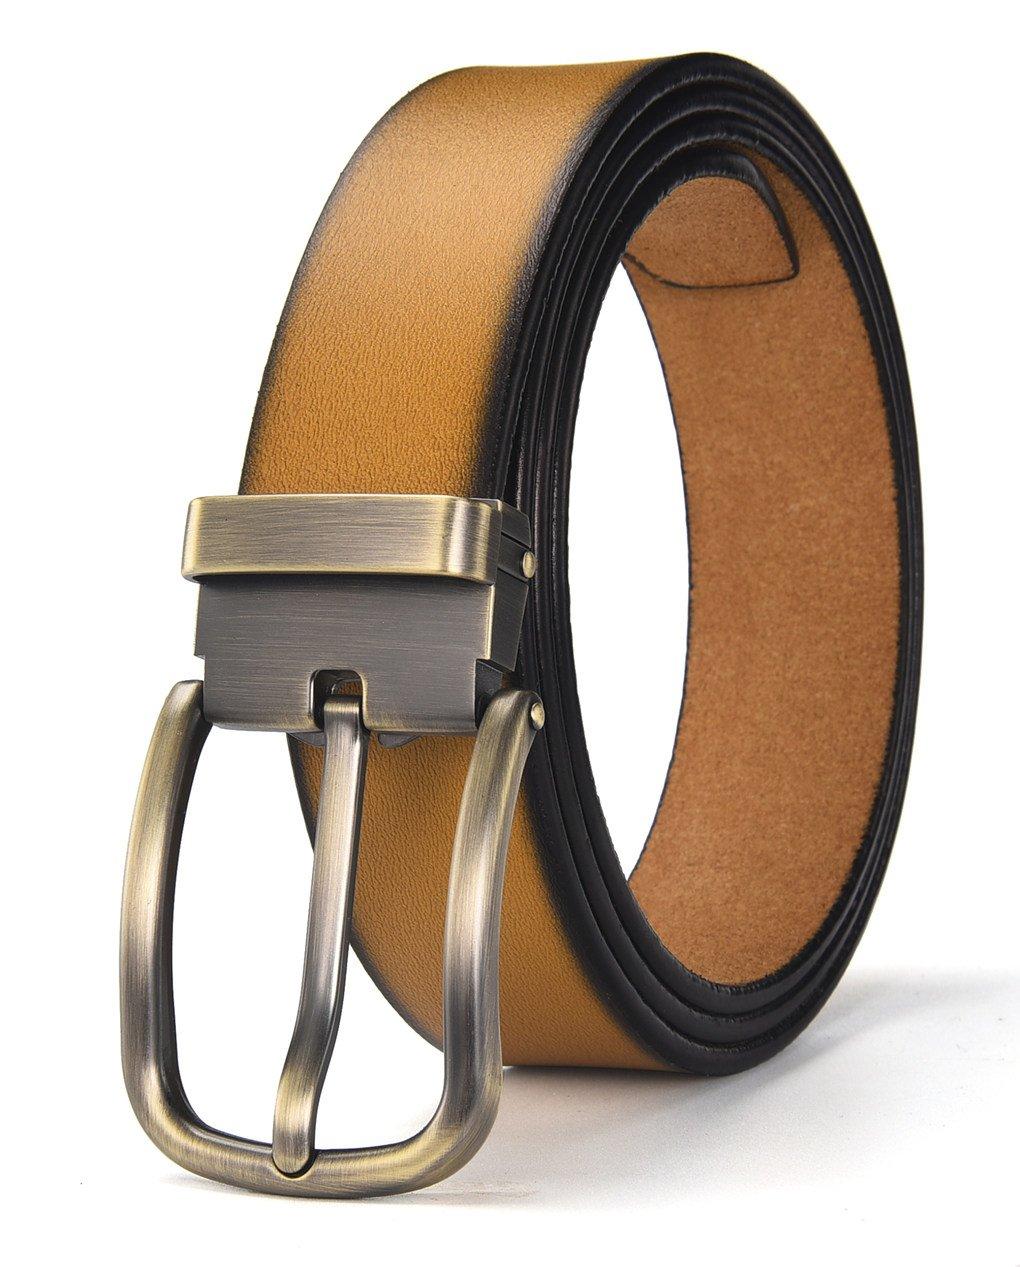 Autolock Cowhide Leather Belt for Men Classic Pin Buckle Belt